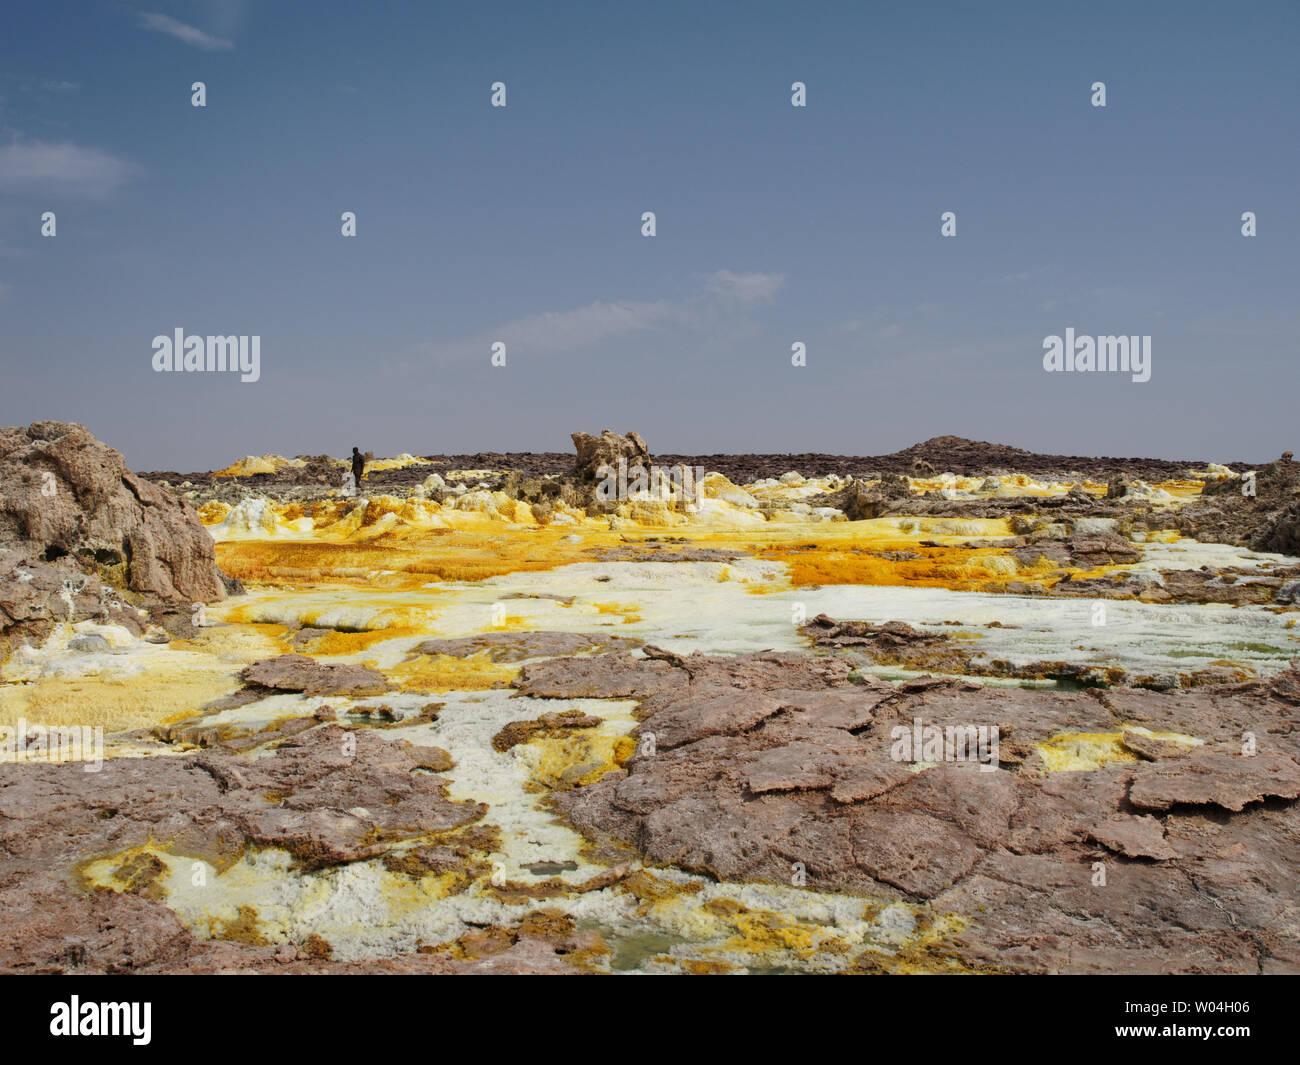 Dallol vulcano sulphur hot springs Stock Photo